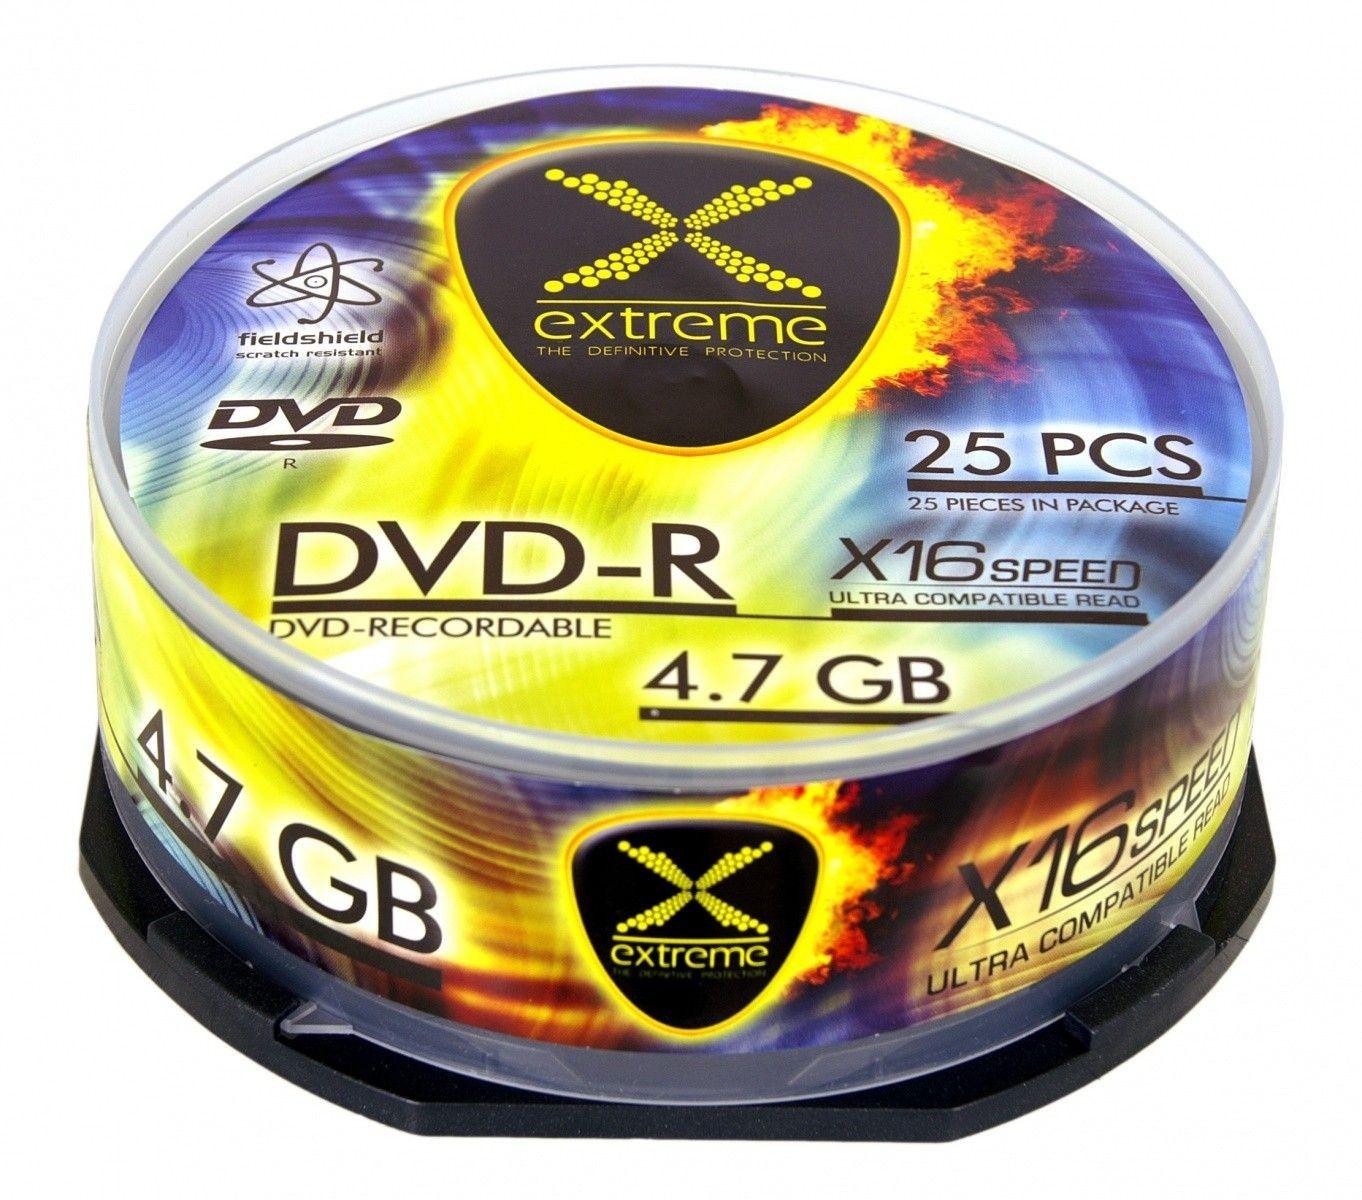 Esperanza DVD-R EXTREME 4,7 GB x16 CAKE BOX 25